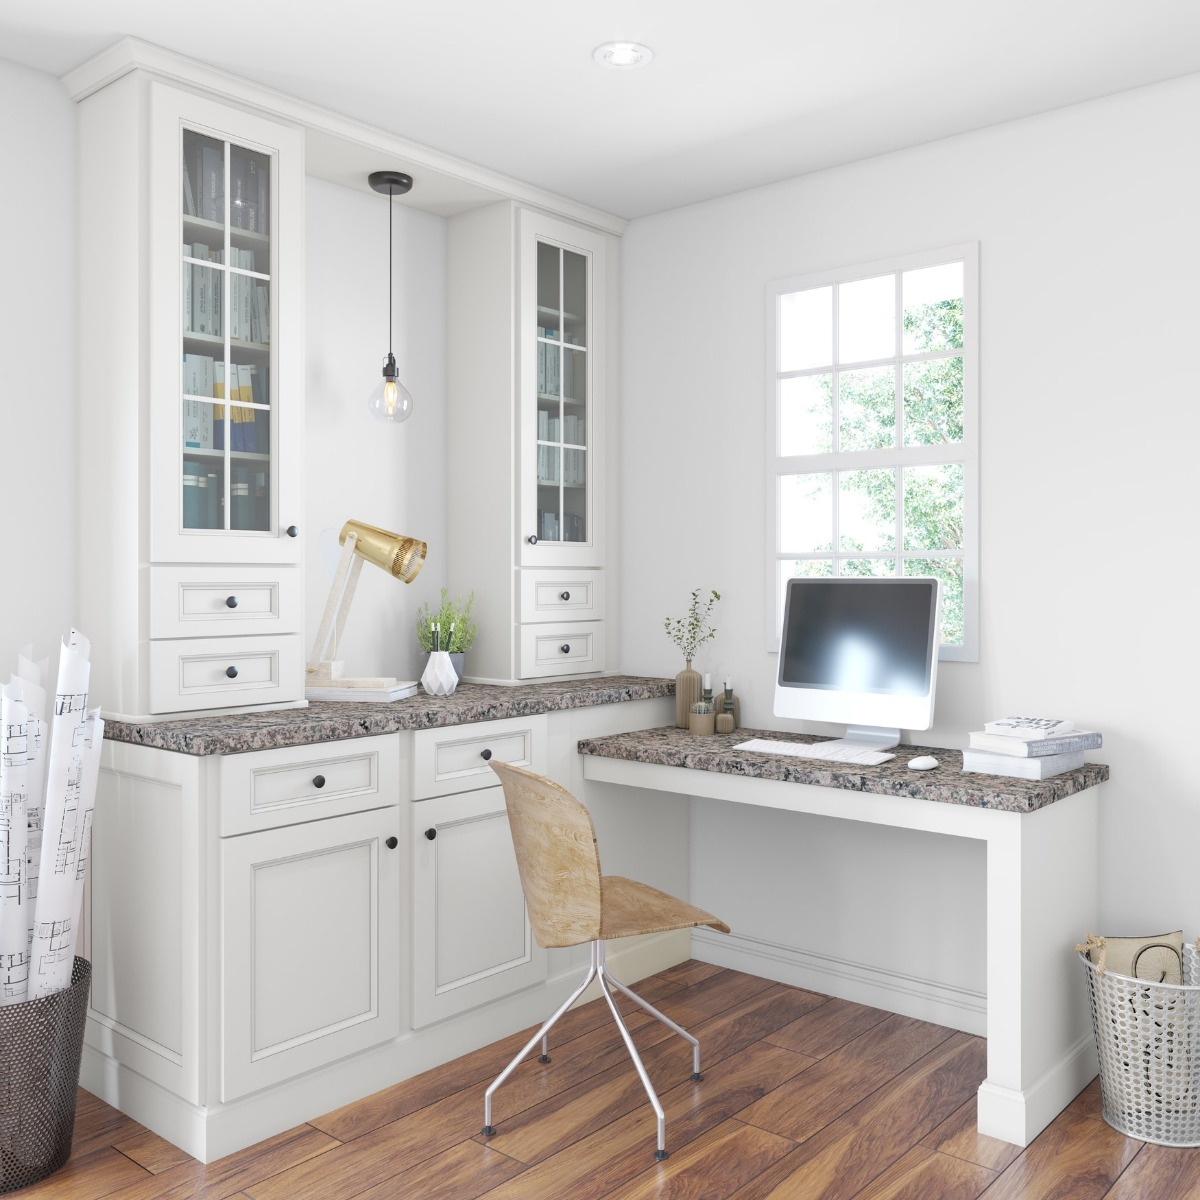 Nutmeg Twist - Ready To Assemble Kitchen Cabinets ...